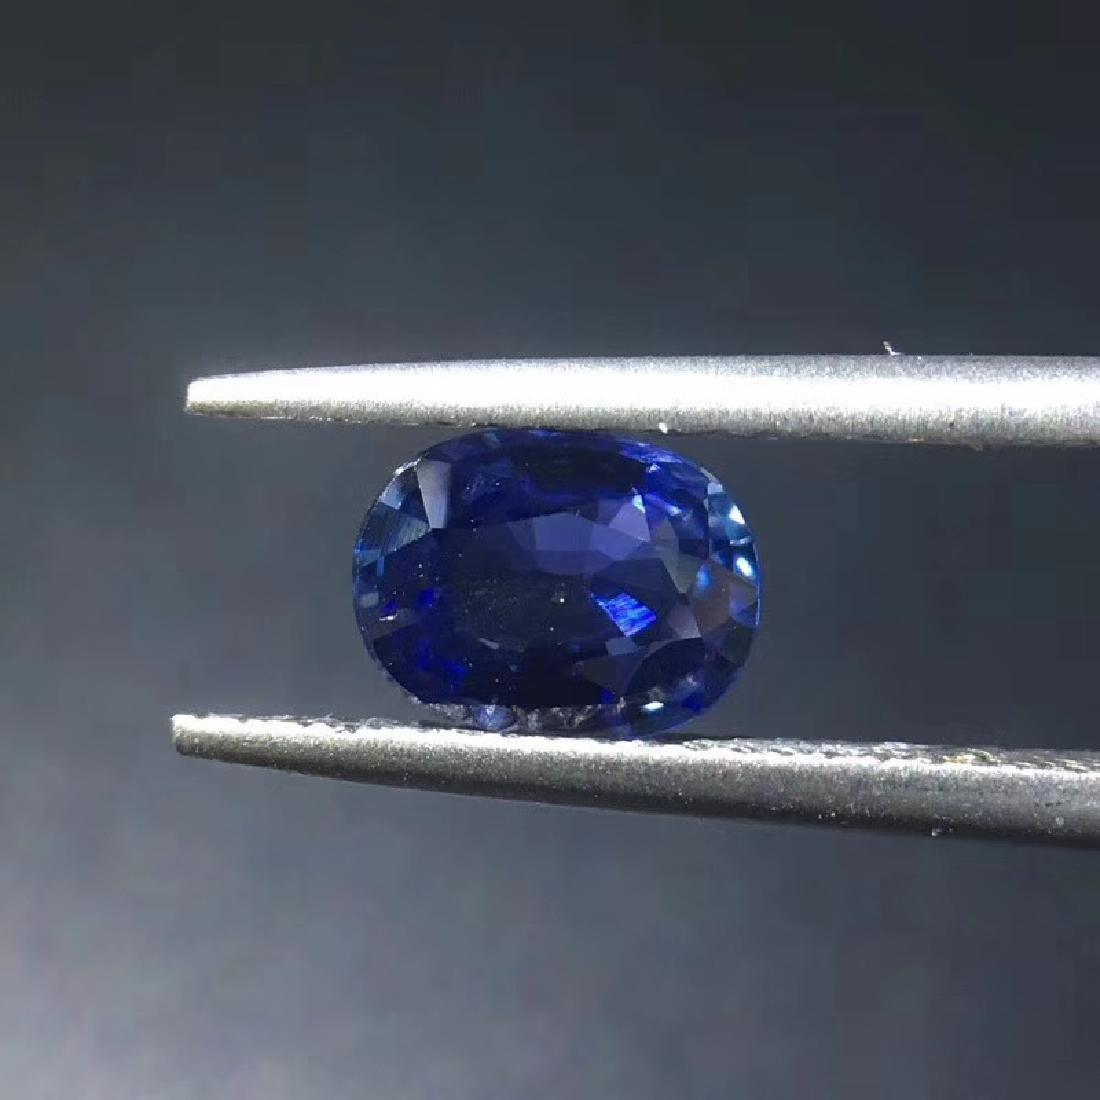 1.07 ct Sapphire 5.3*7.0*3.0 mm Oval Cut